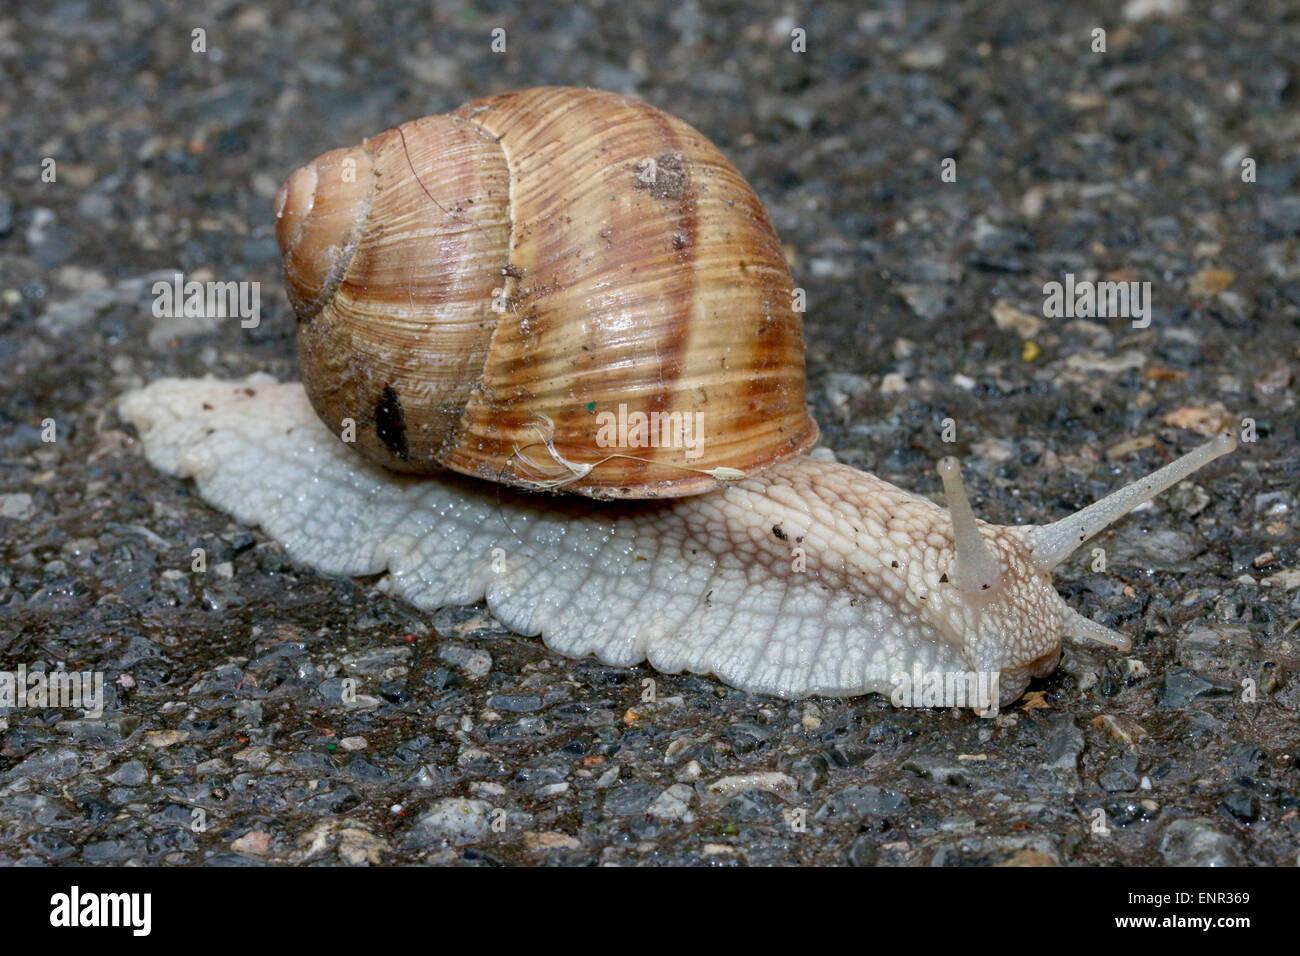 Snail on the asphalt, closeup shot. Stock Photo